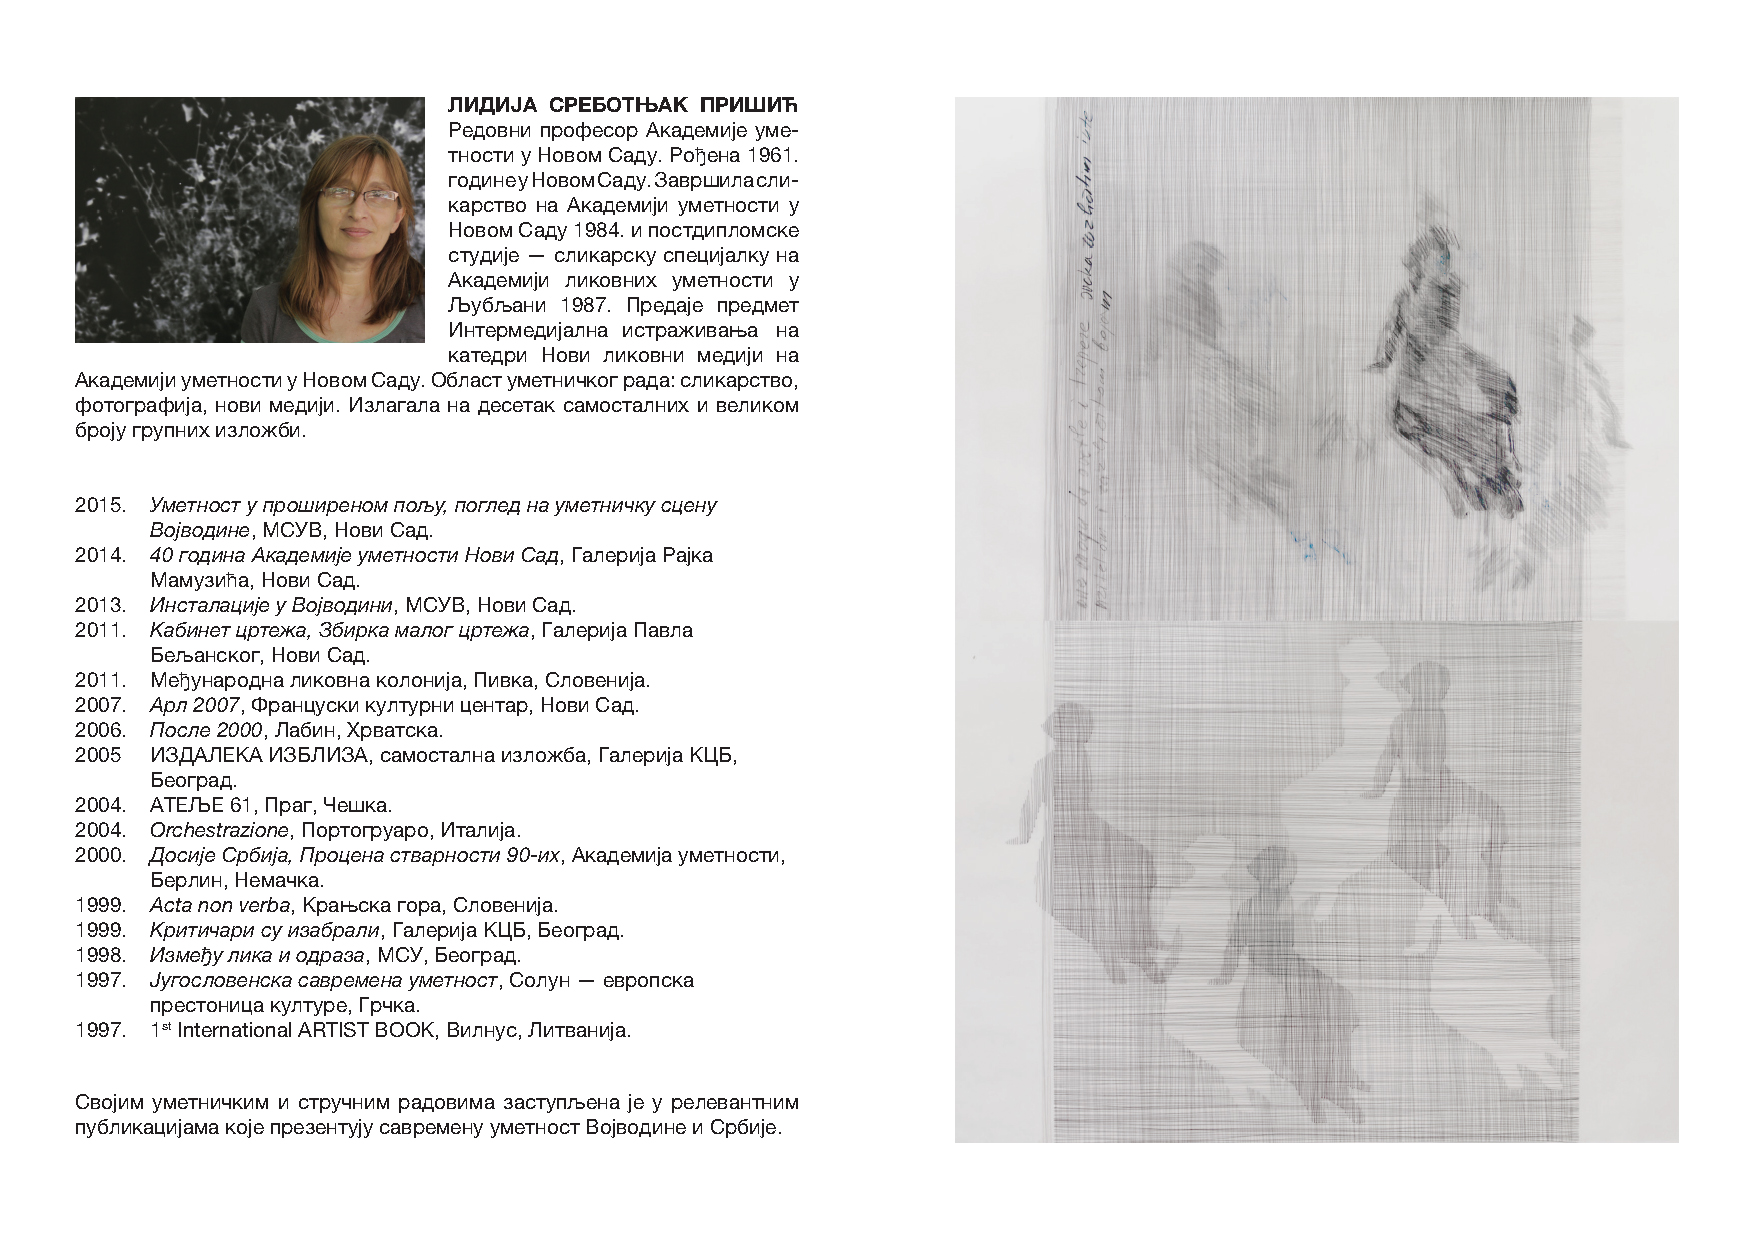 Lidija-katalog-unutra-v2 (2)